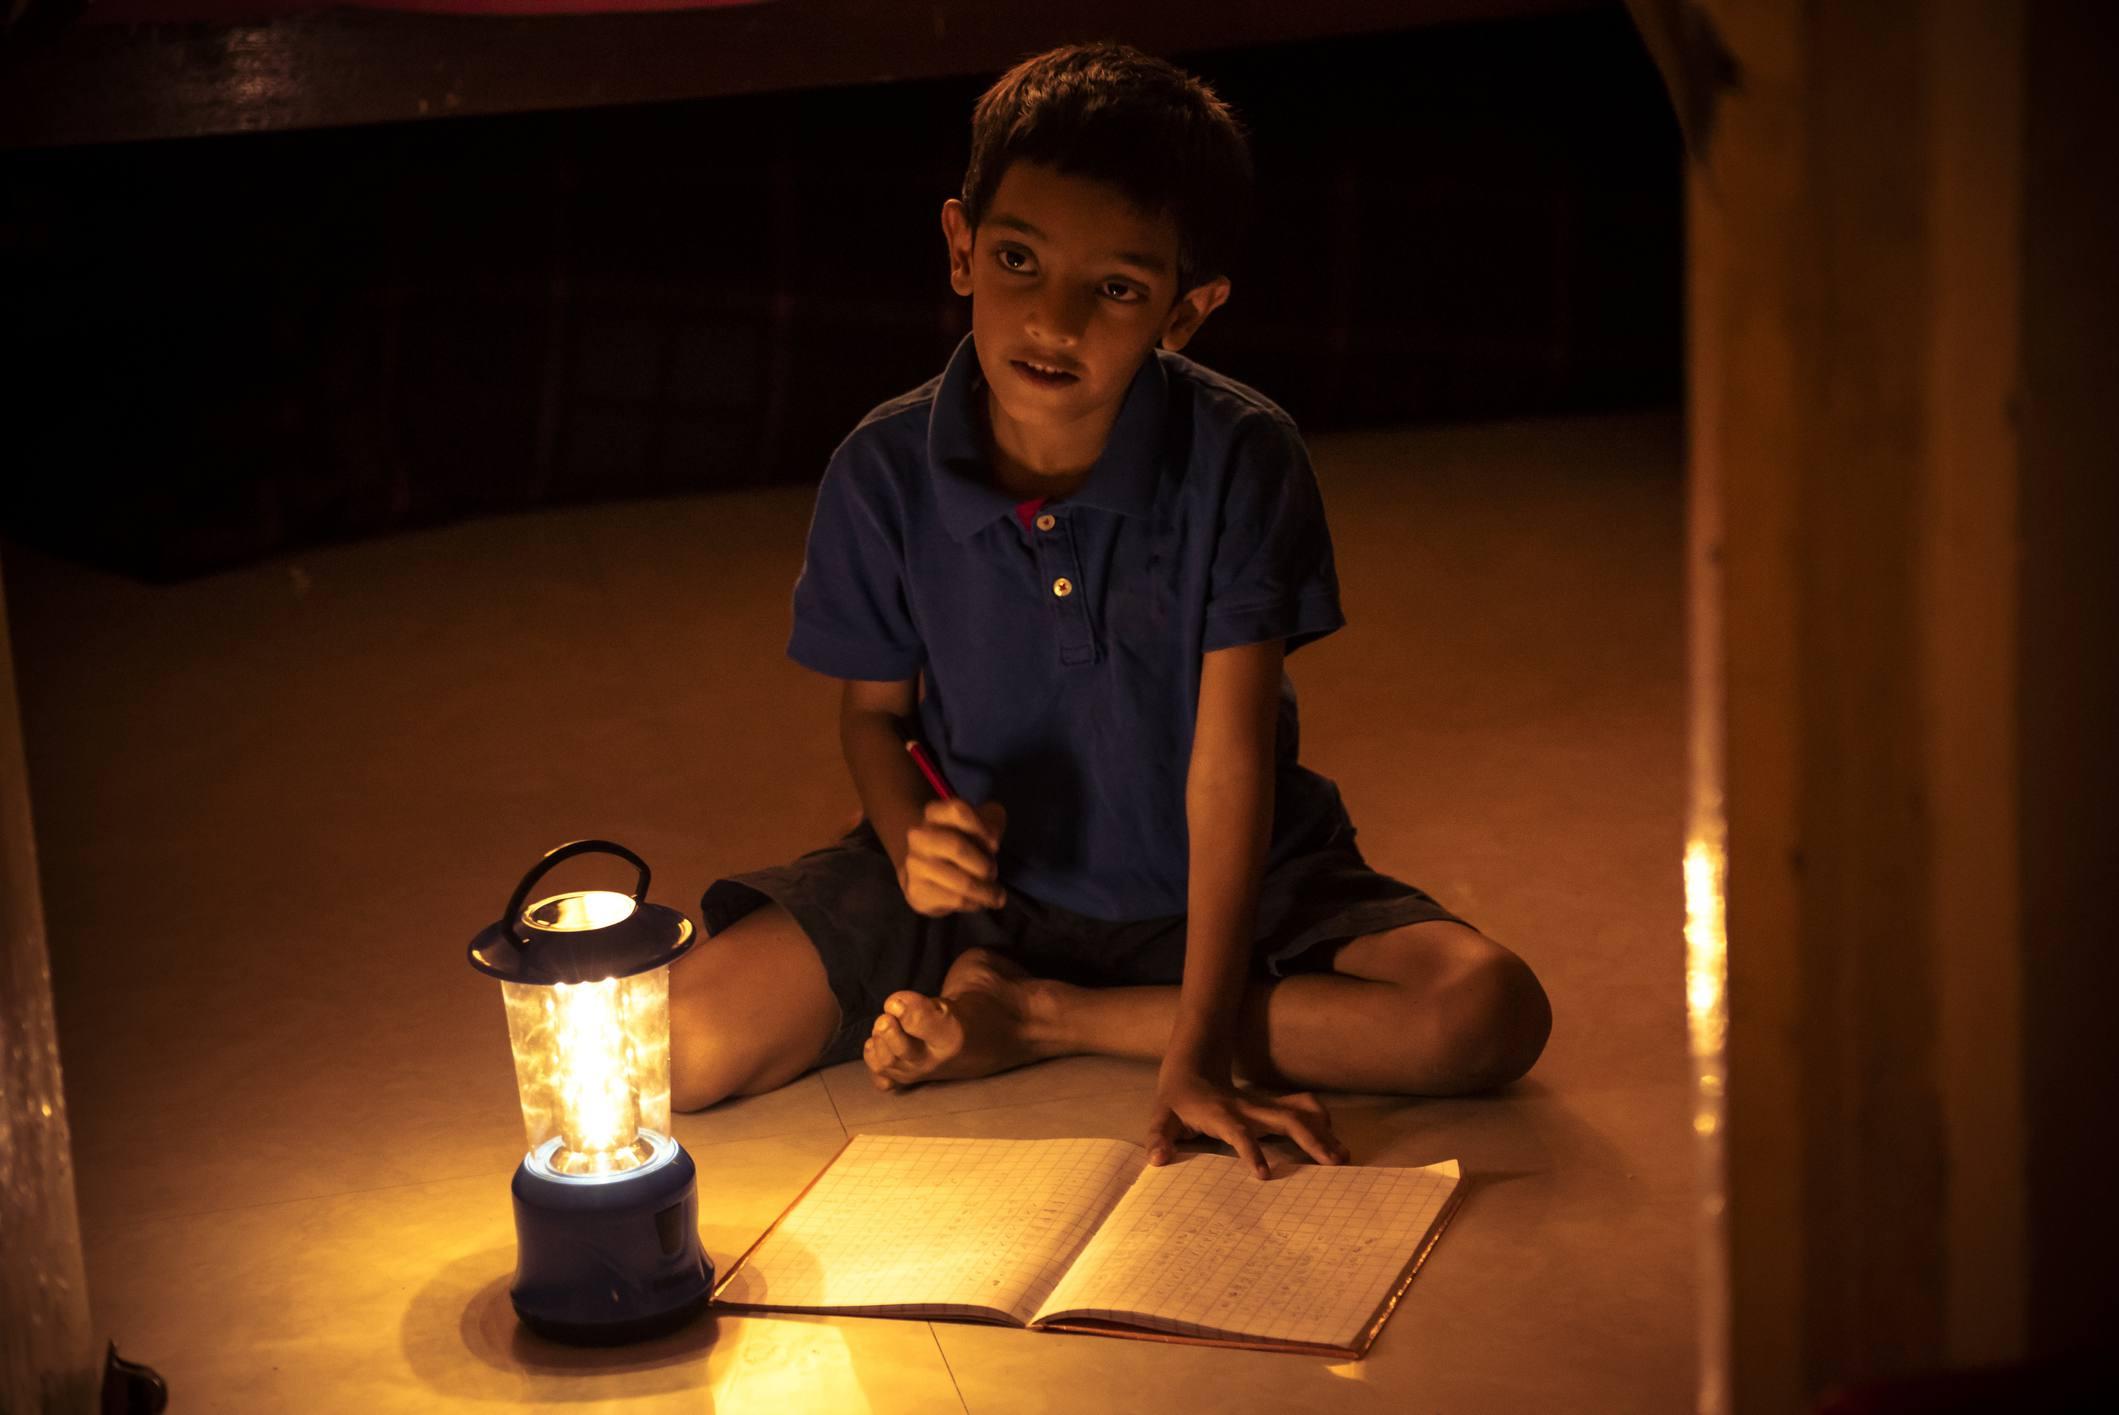 Boy writing in notebook under light of solar lantern